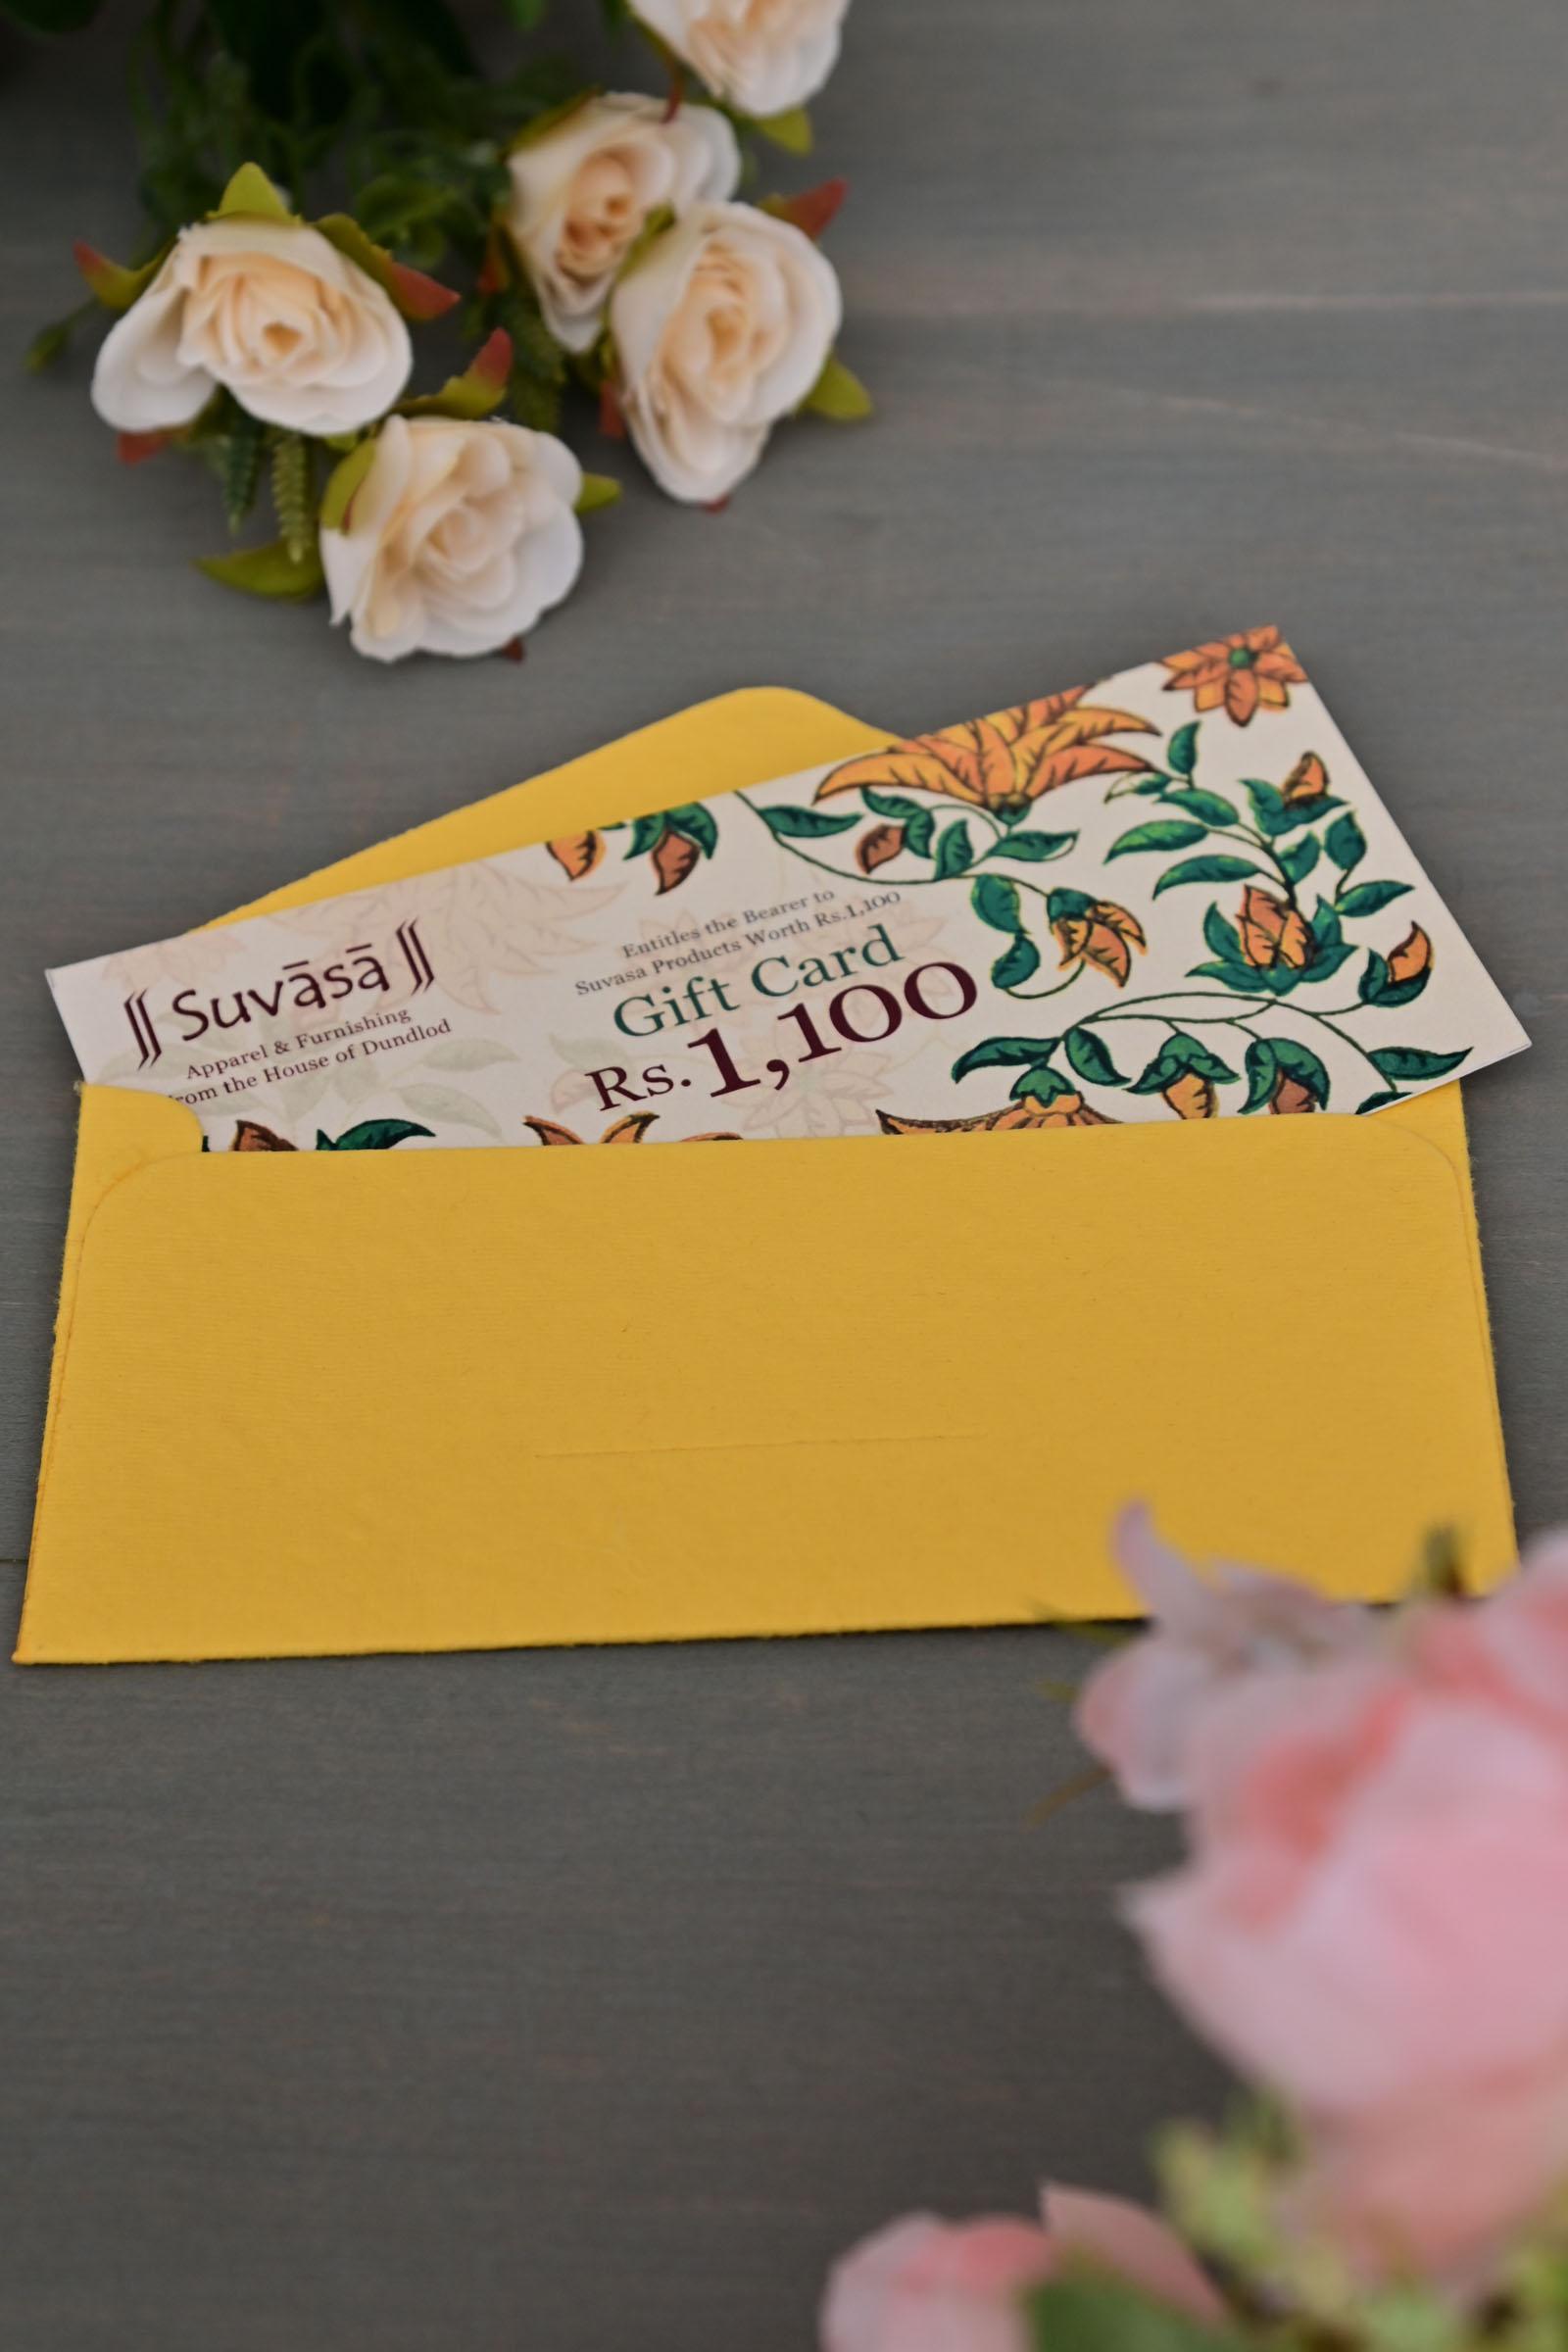 Gift Card 1100